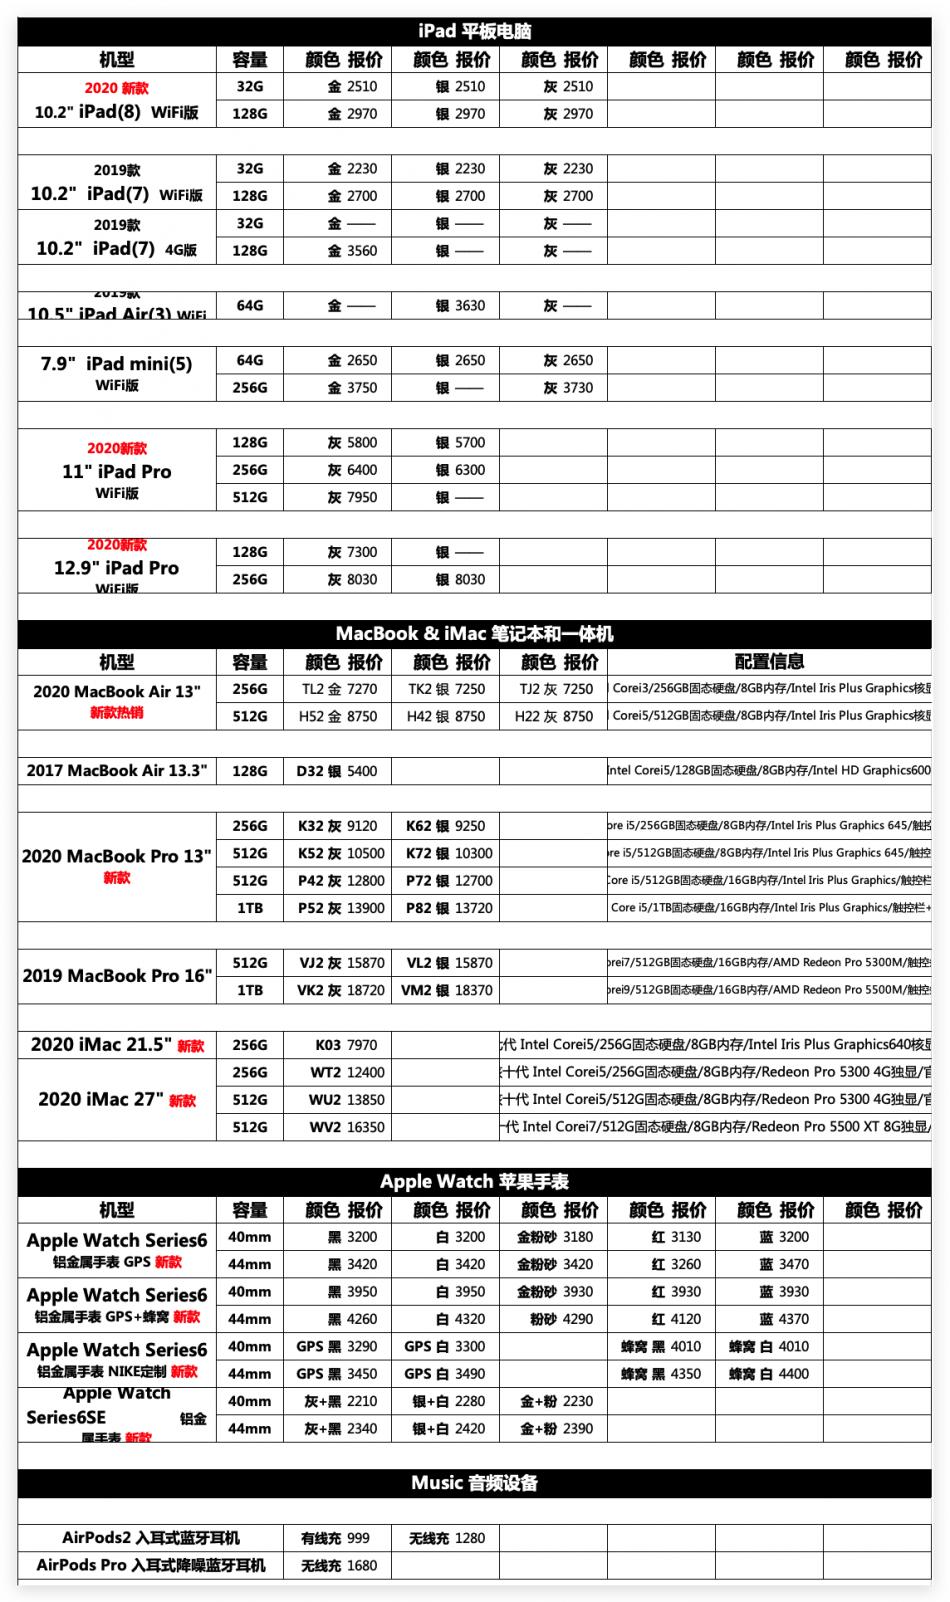 Xnip2020-10-15_14-53-57.png